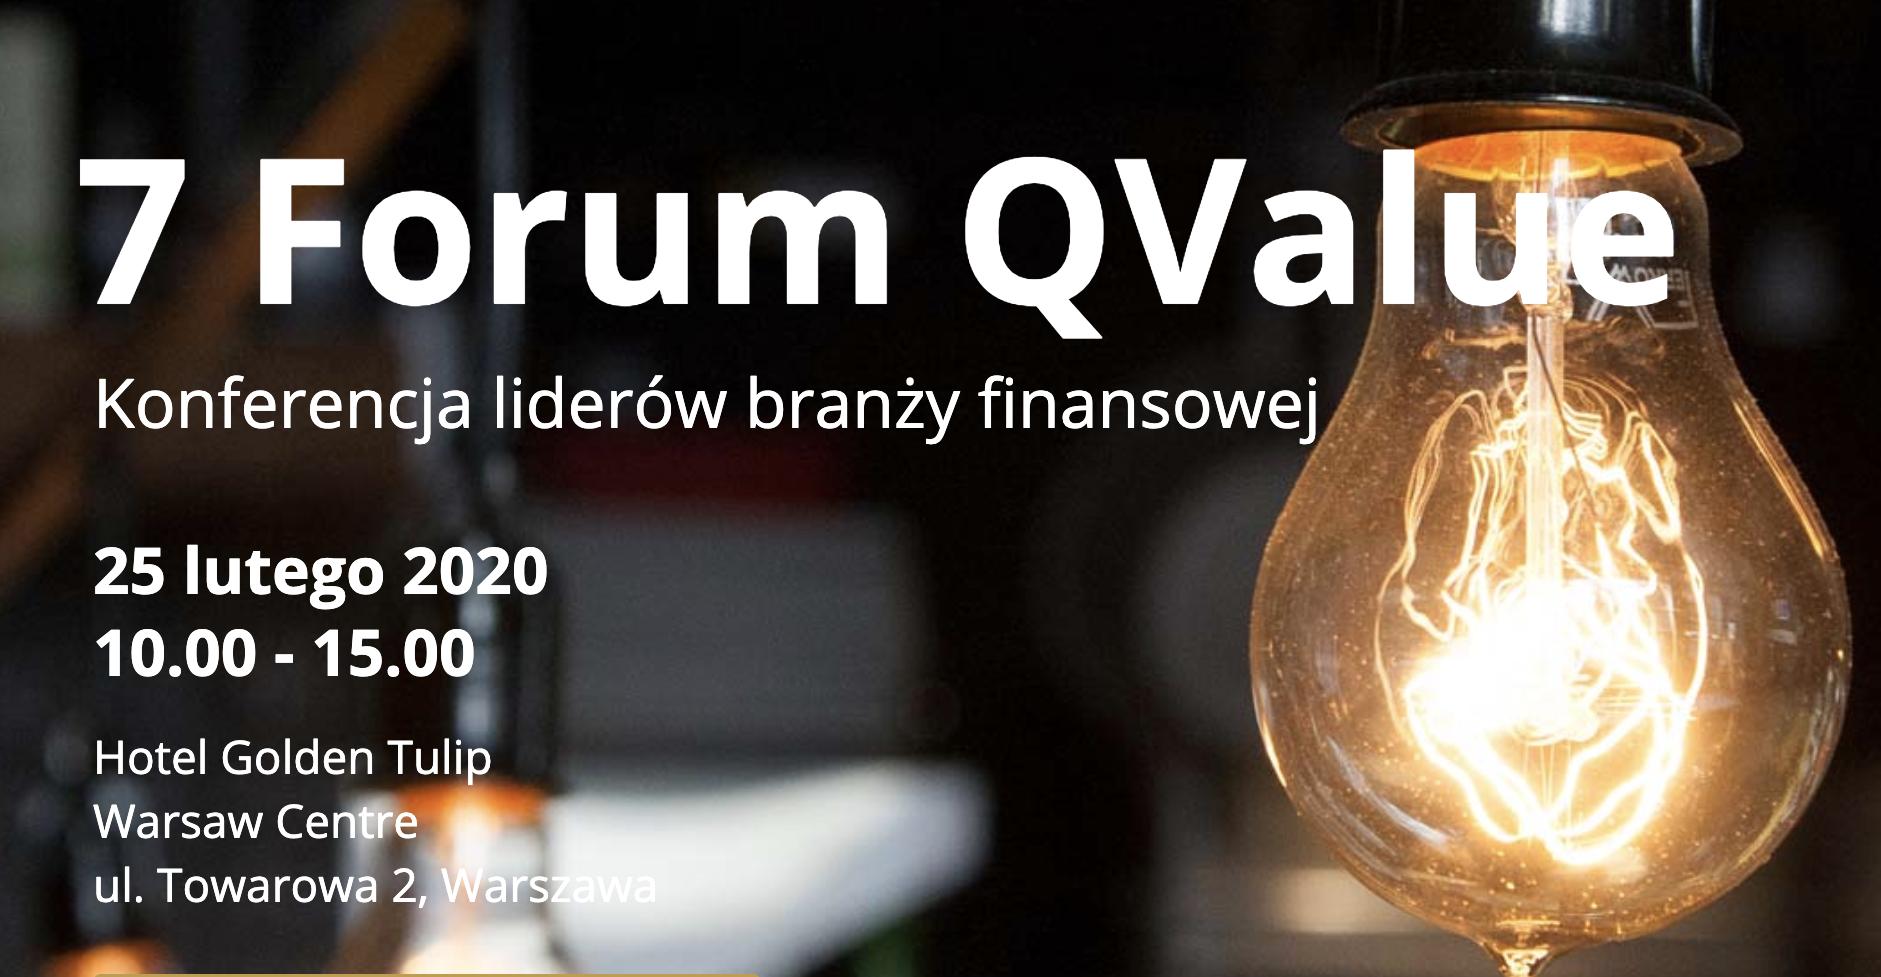 7 Forum Q Value – 25.02.2020 r., Hotel Golden Tulip Warsaw Center